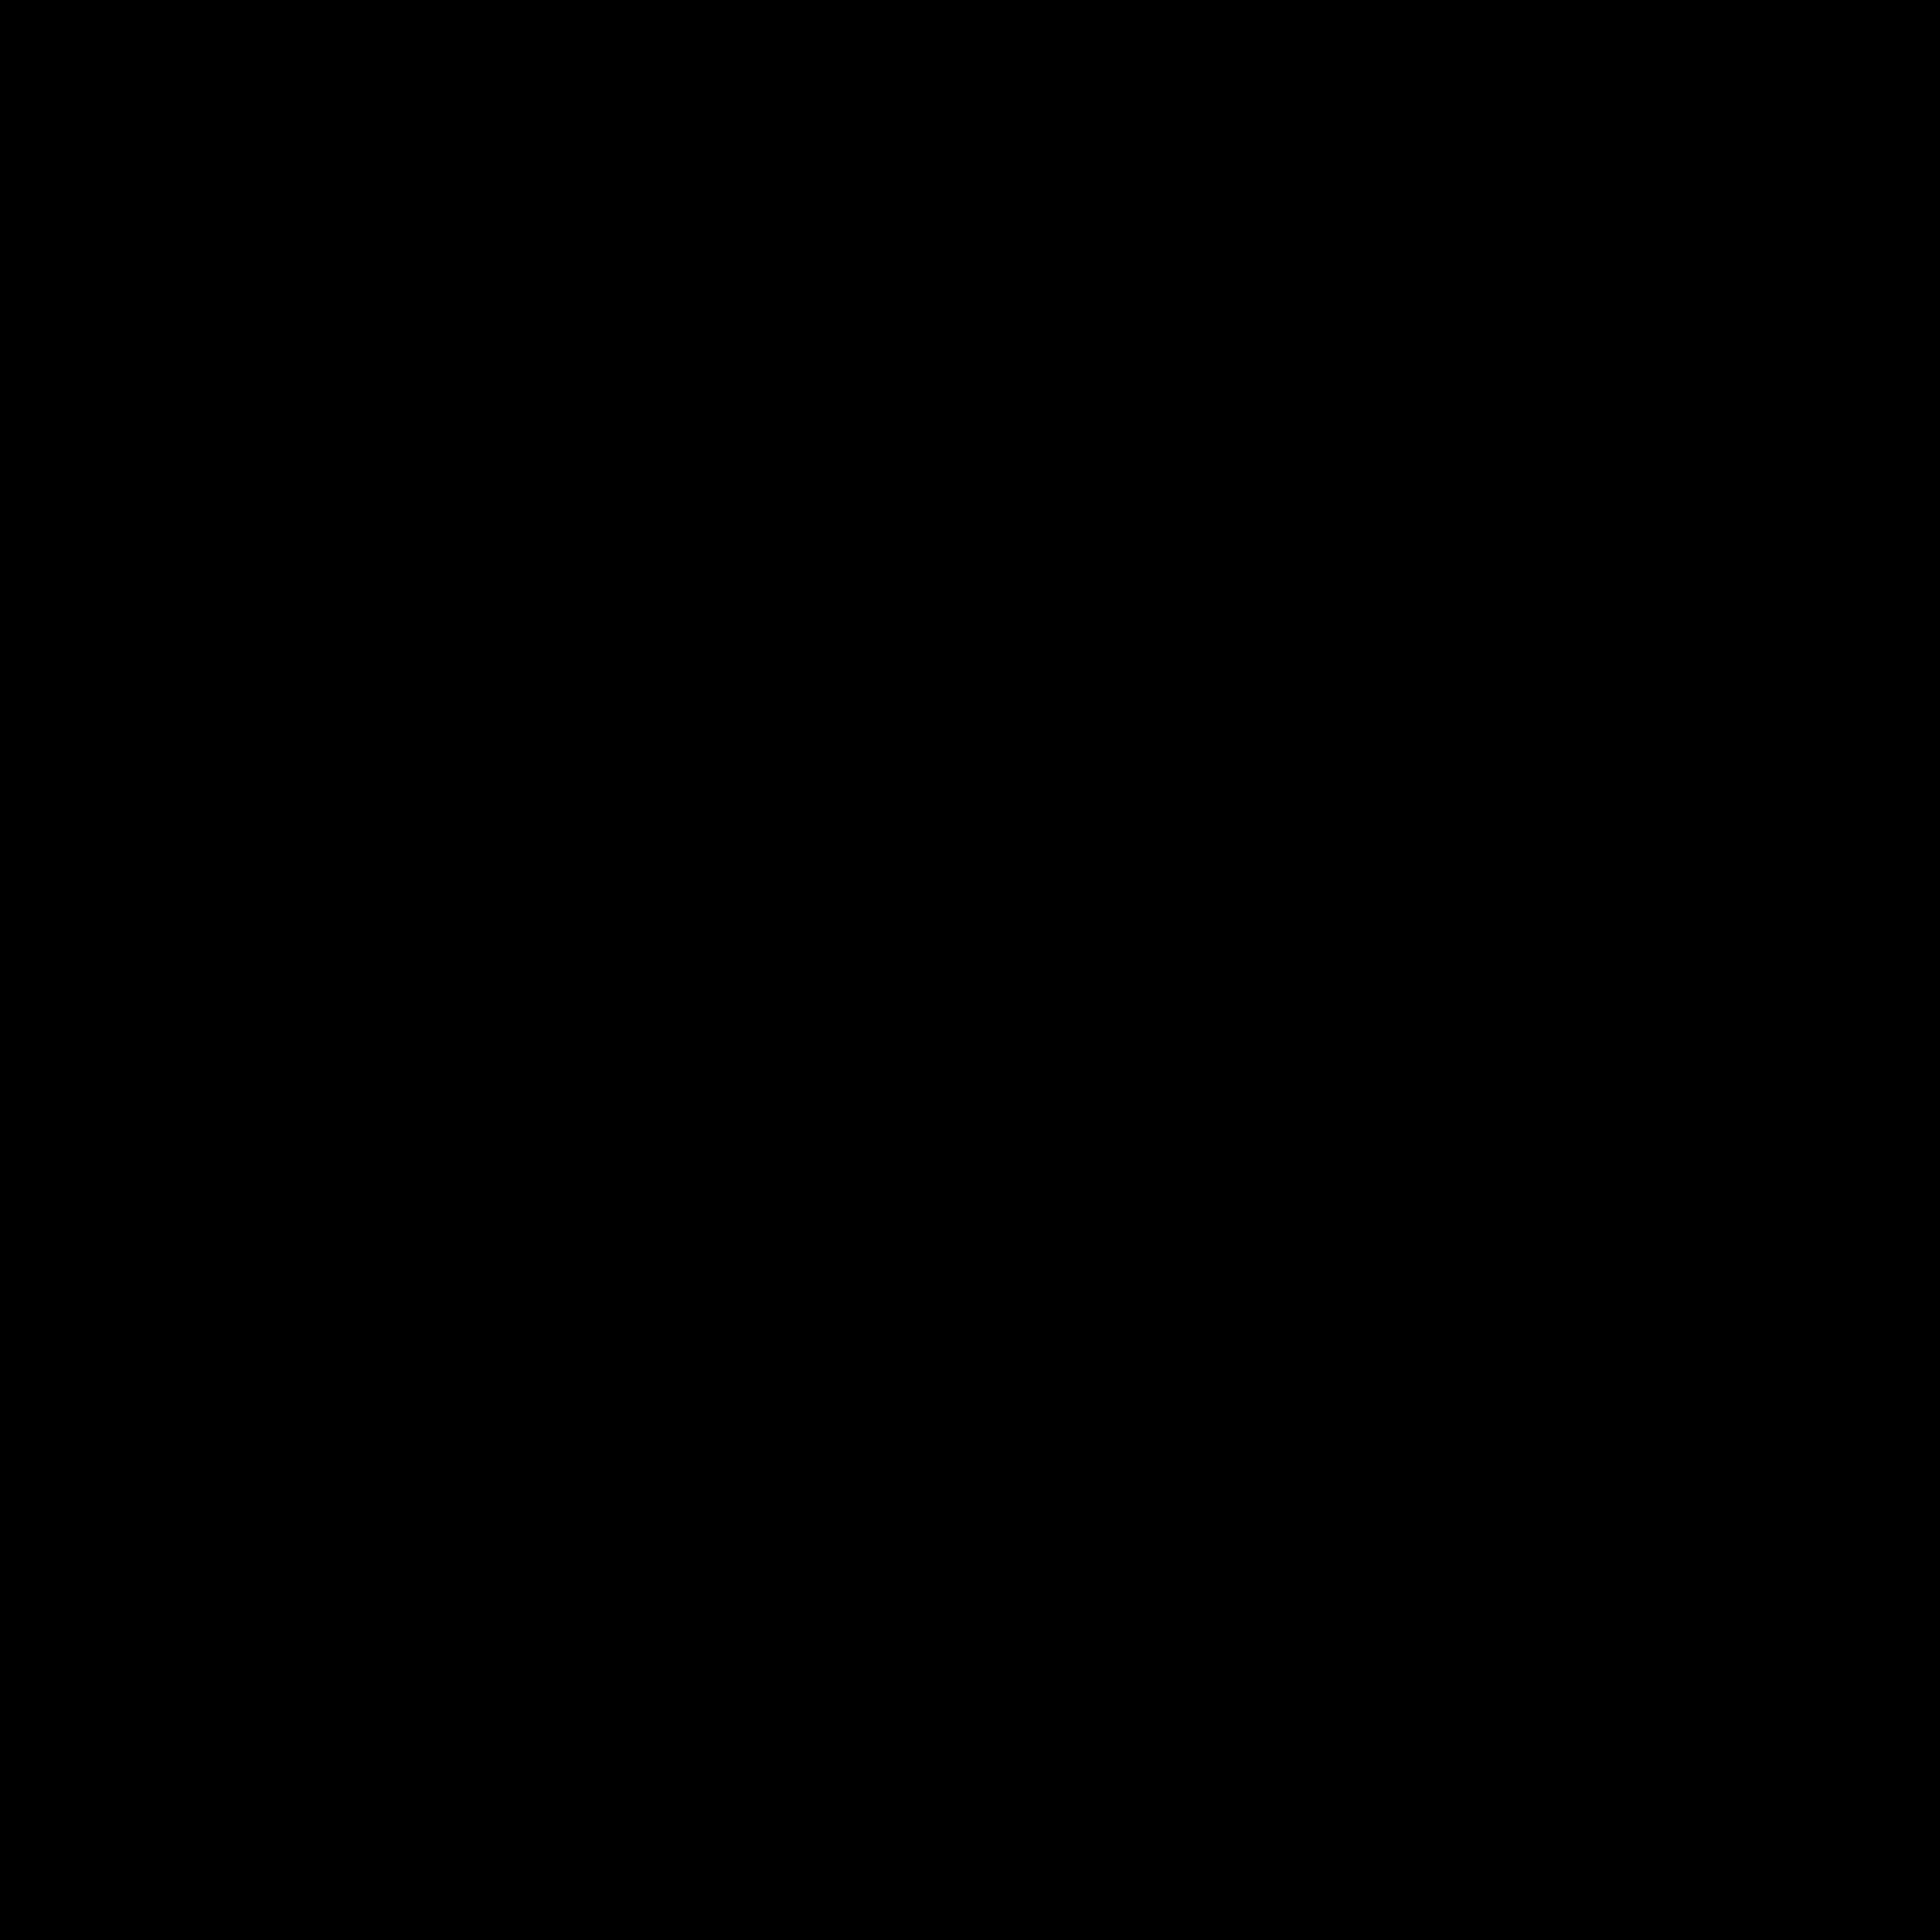 @bengokcraft Profile Image | Linktree